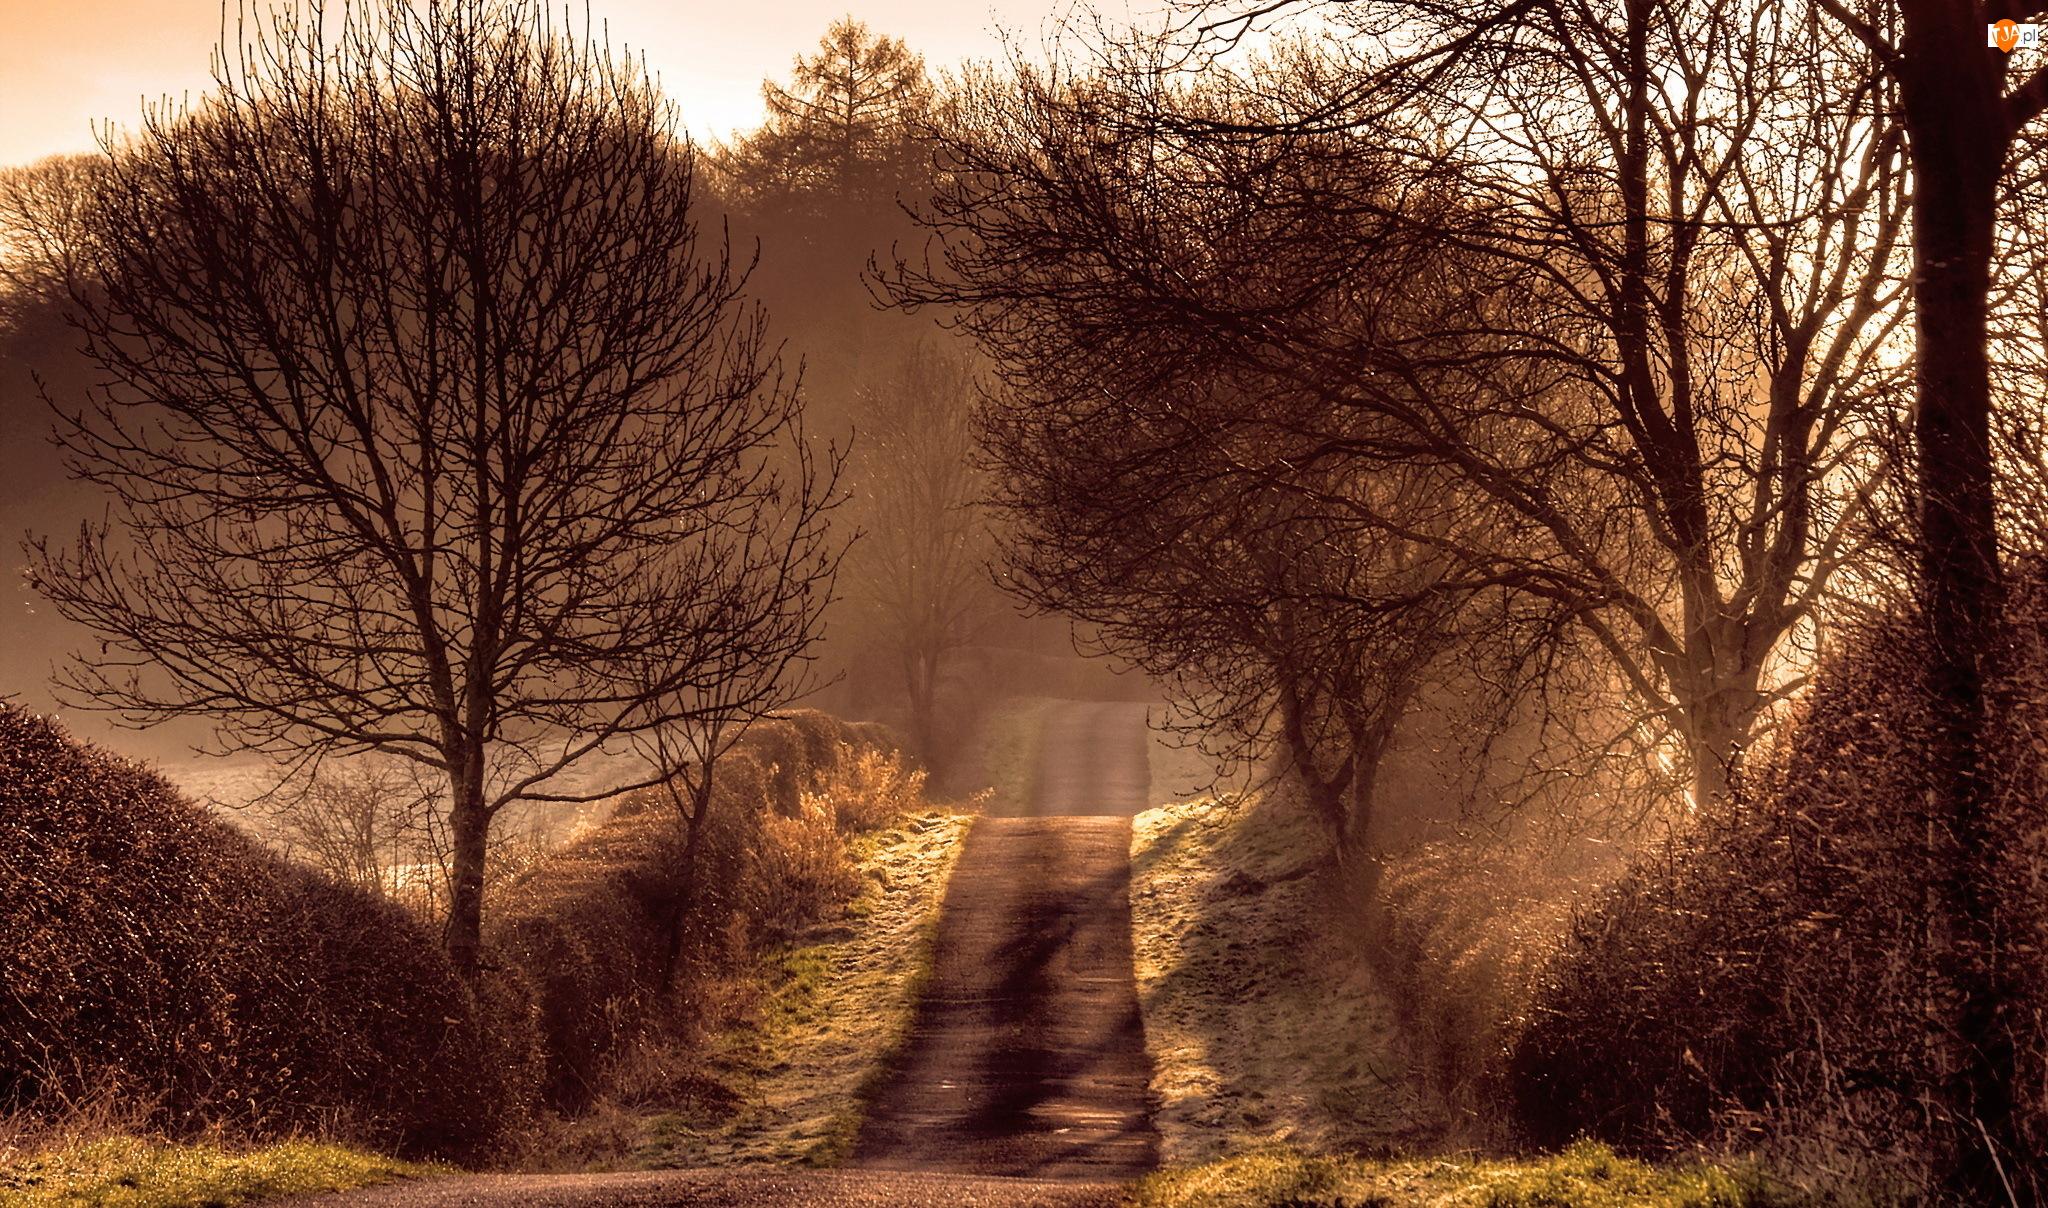 Droga, Sepia, Mgła, Drzewa